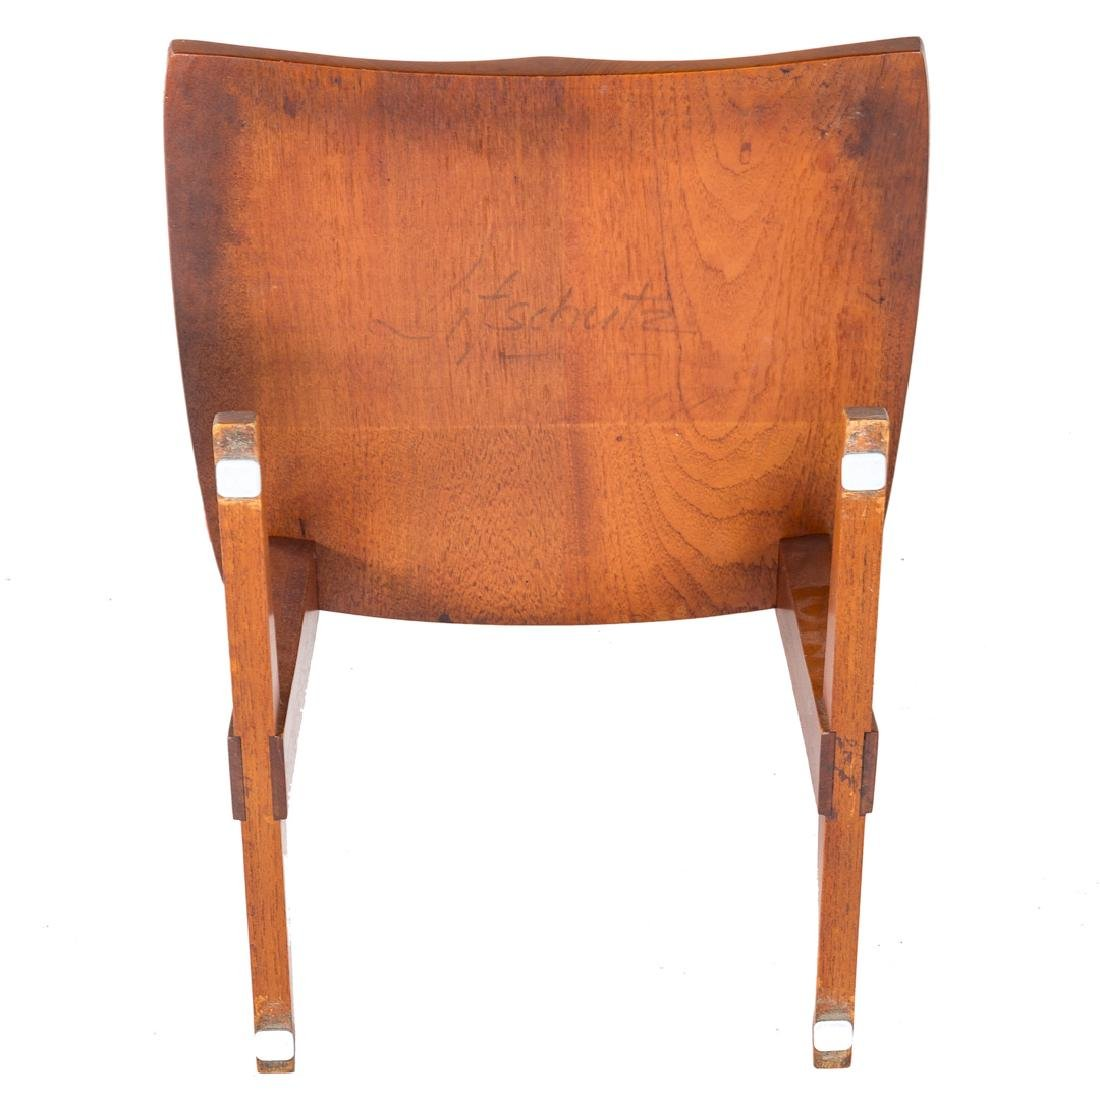 Set of Four George Nakashima Conoid Chairs - 5